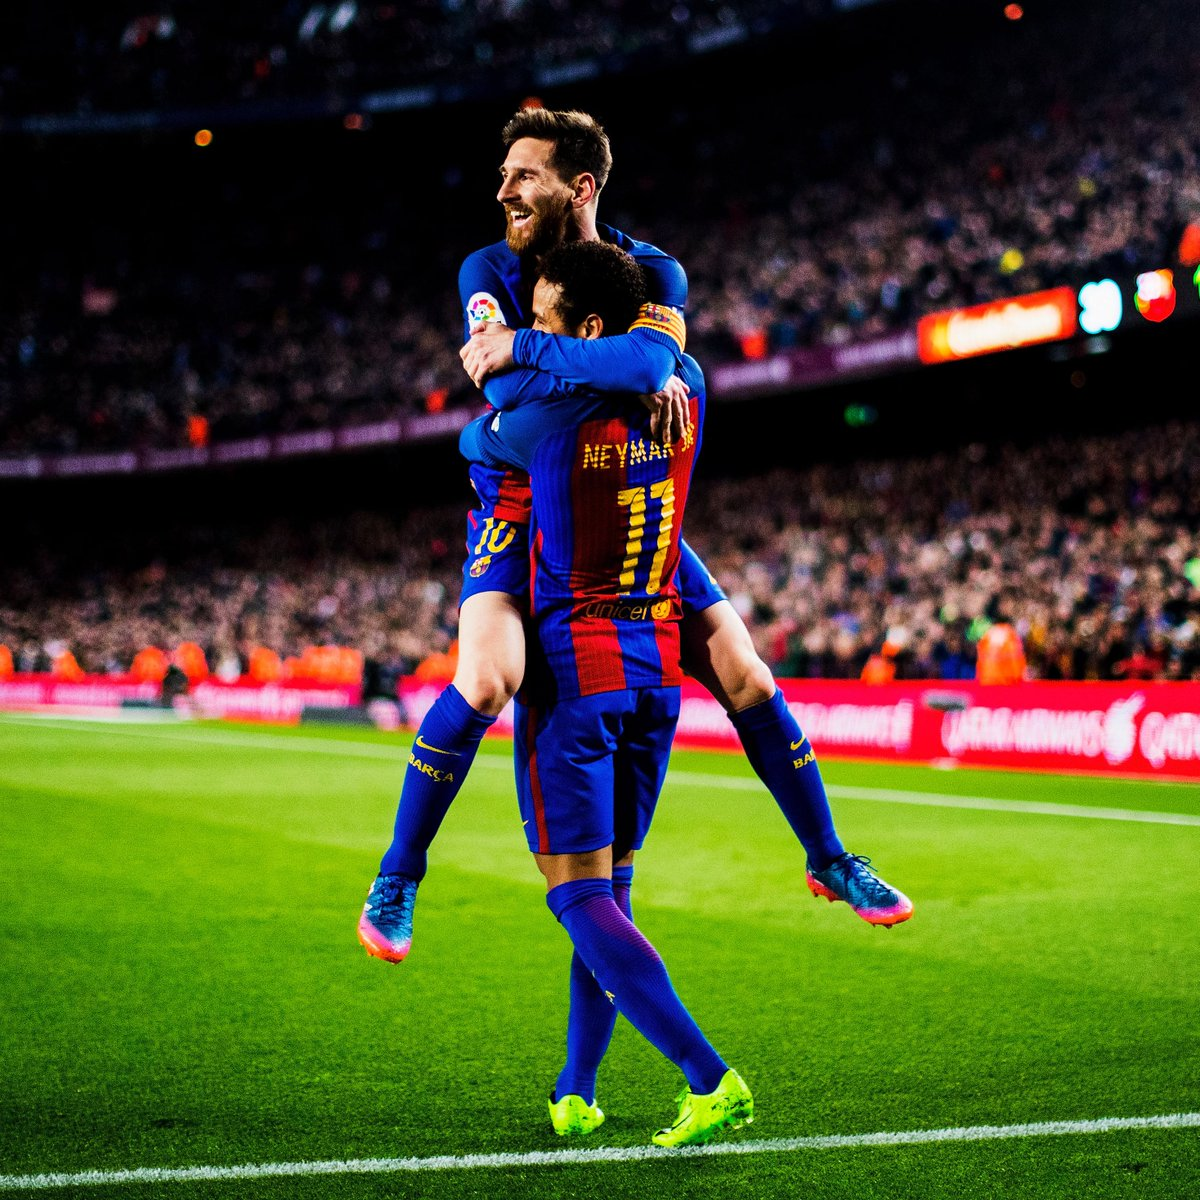 @brfootball's photo on Neymar